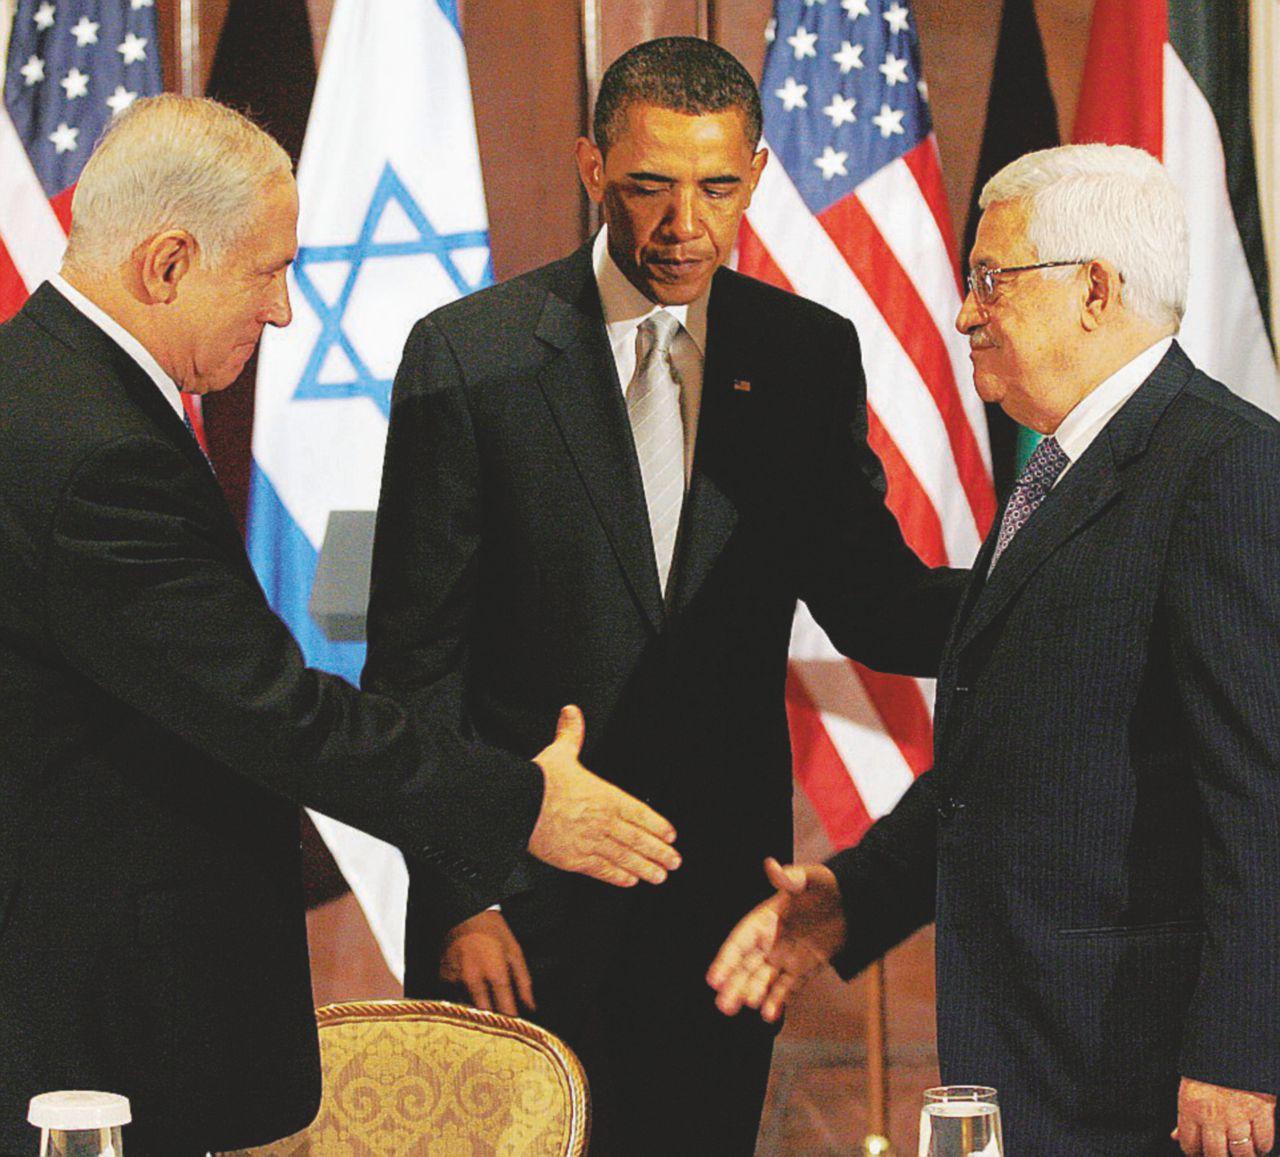 Ciao Obama, palestinesi e israeliani scelgono Putin